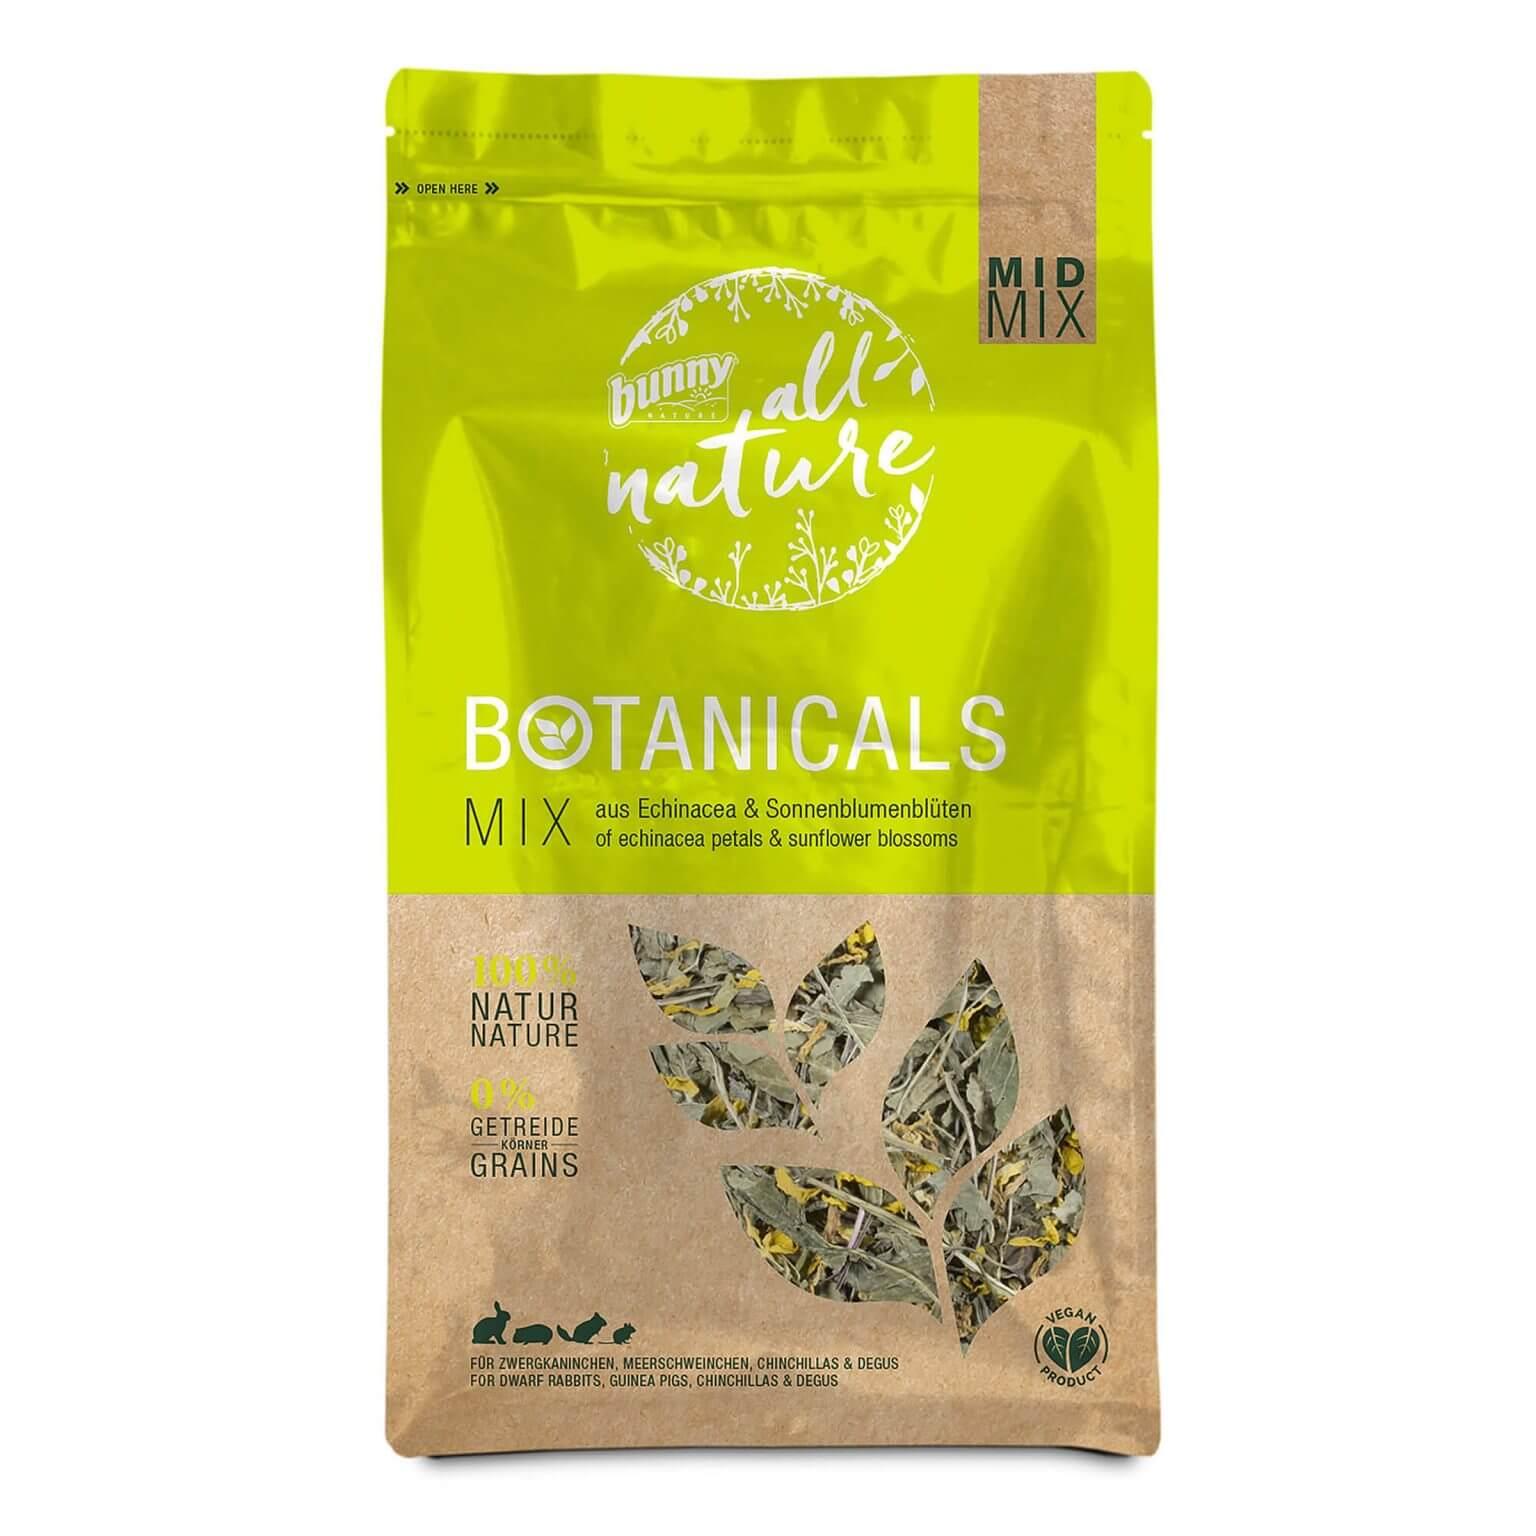 Bunny botanicals mid mix sunflower